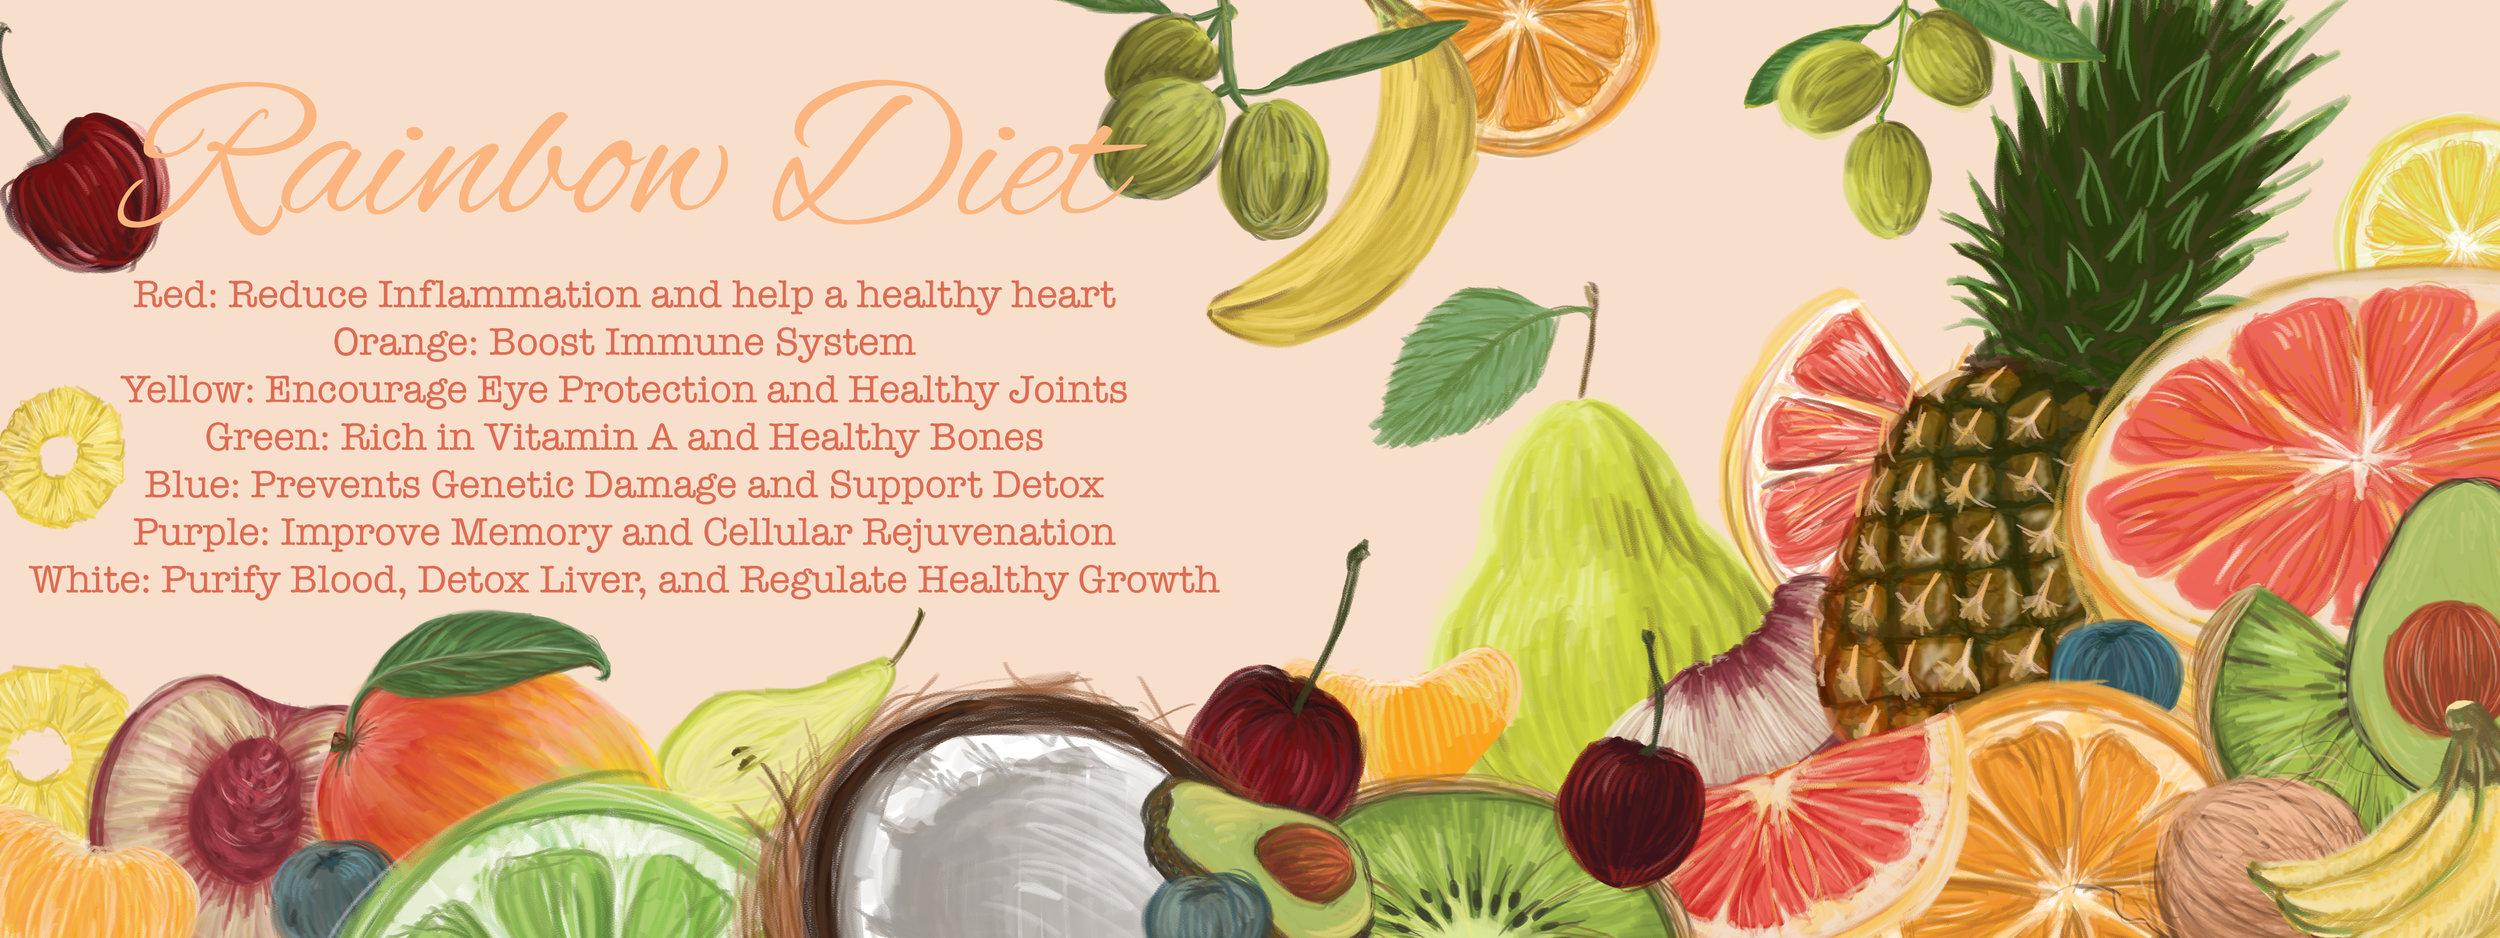 Rainbow Diet.jpg